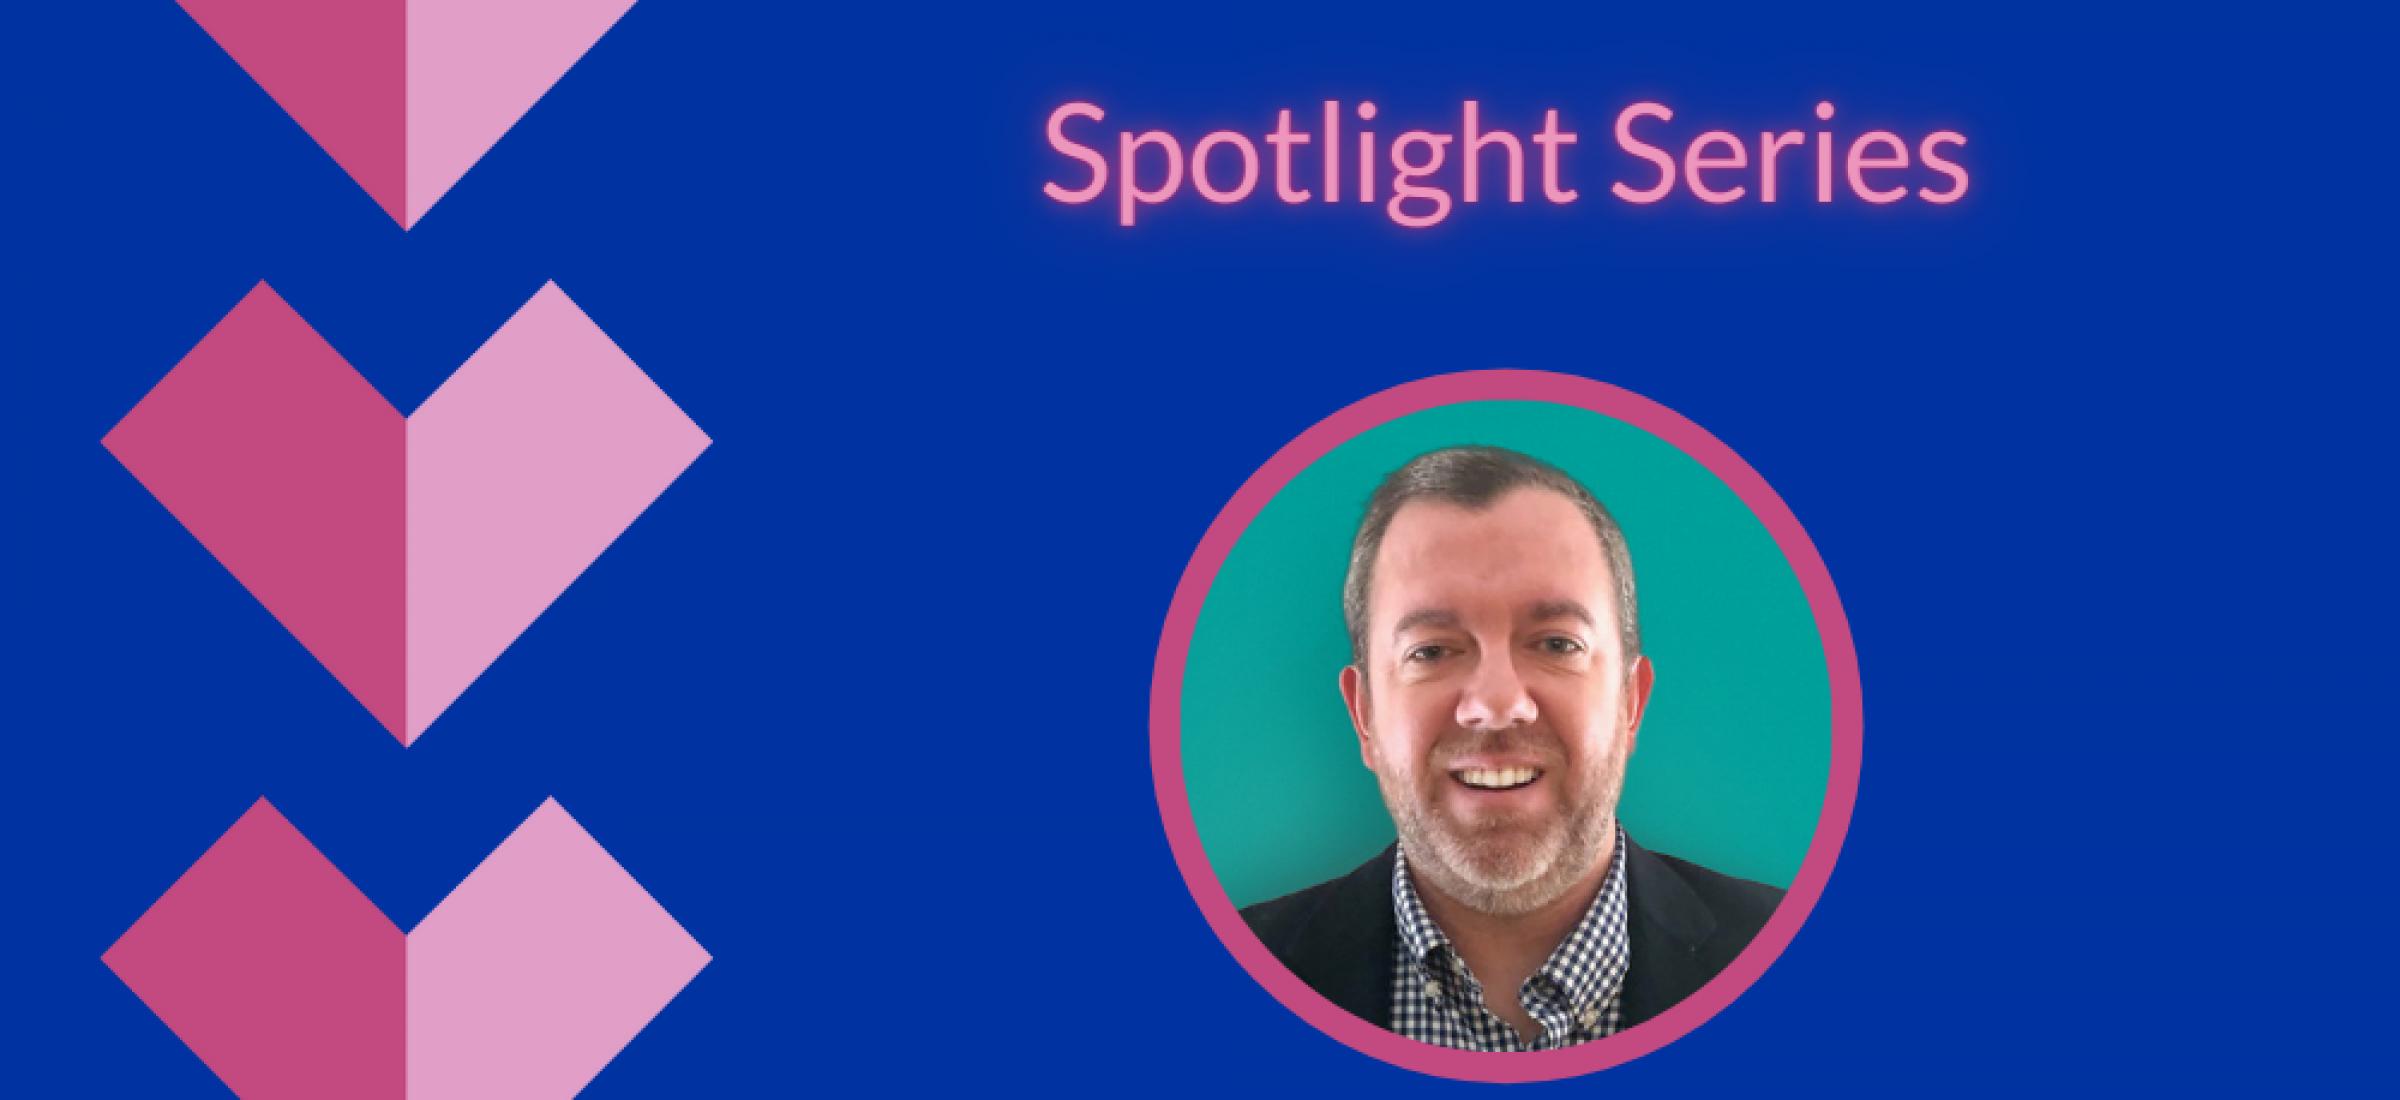 Spotlight Series for Blog PeteF